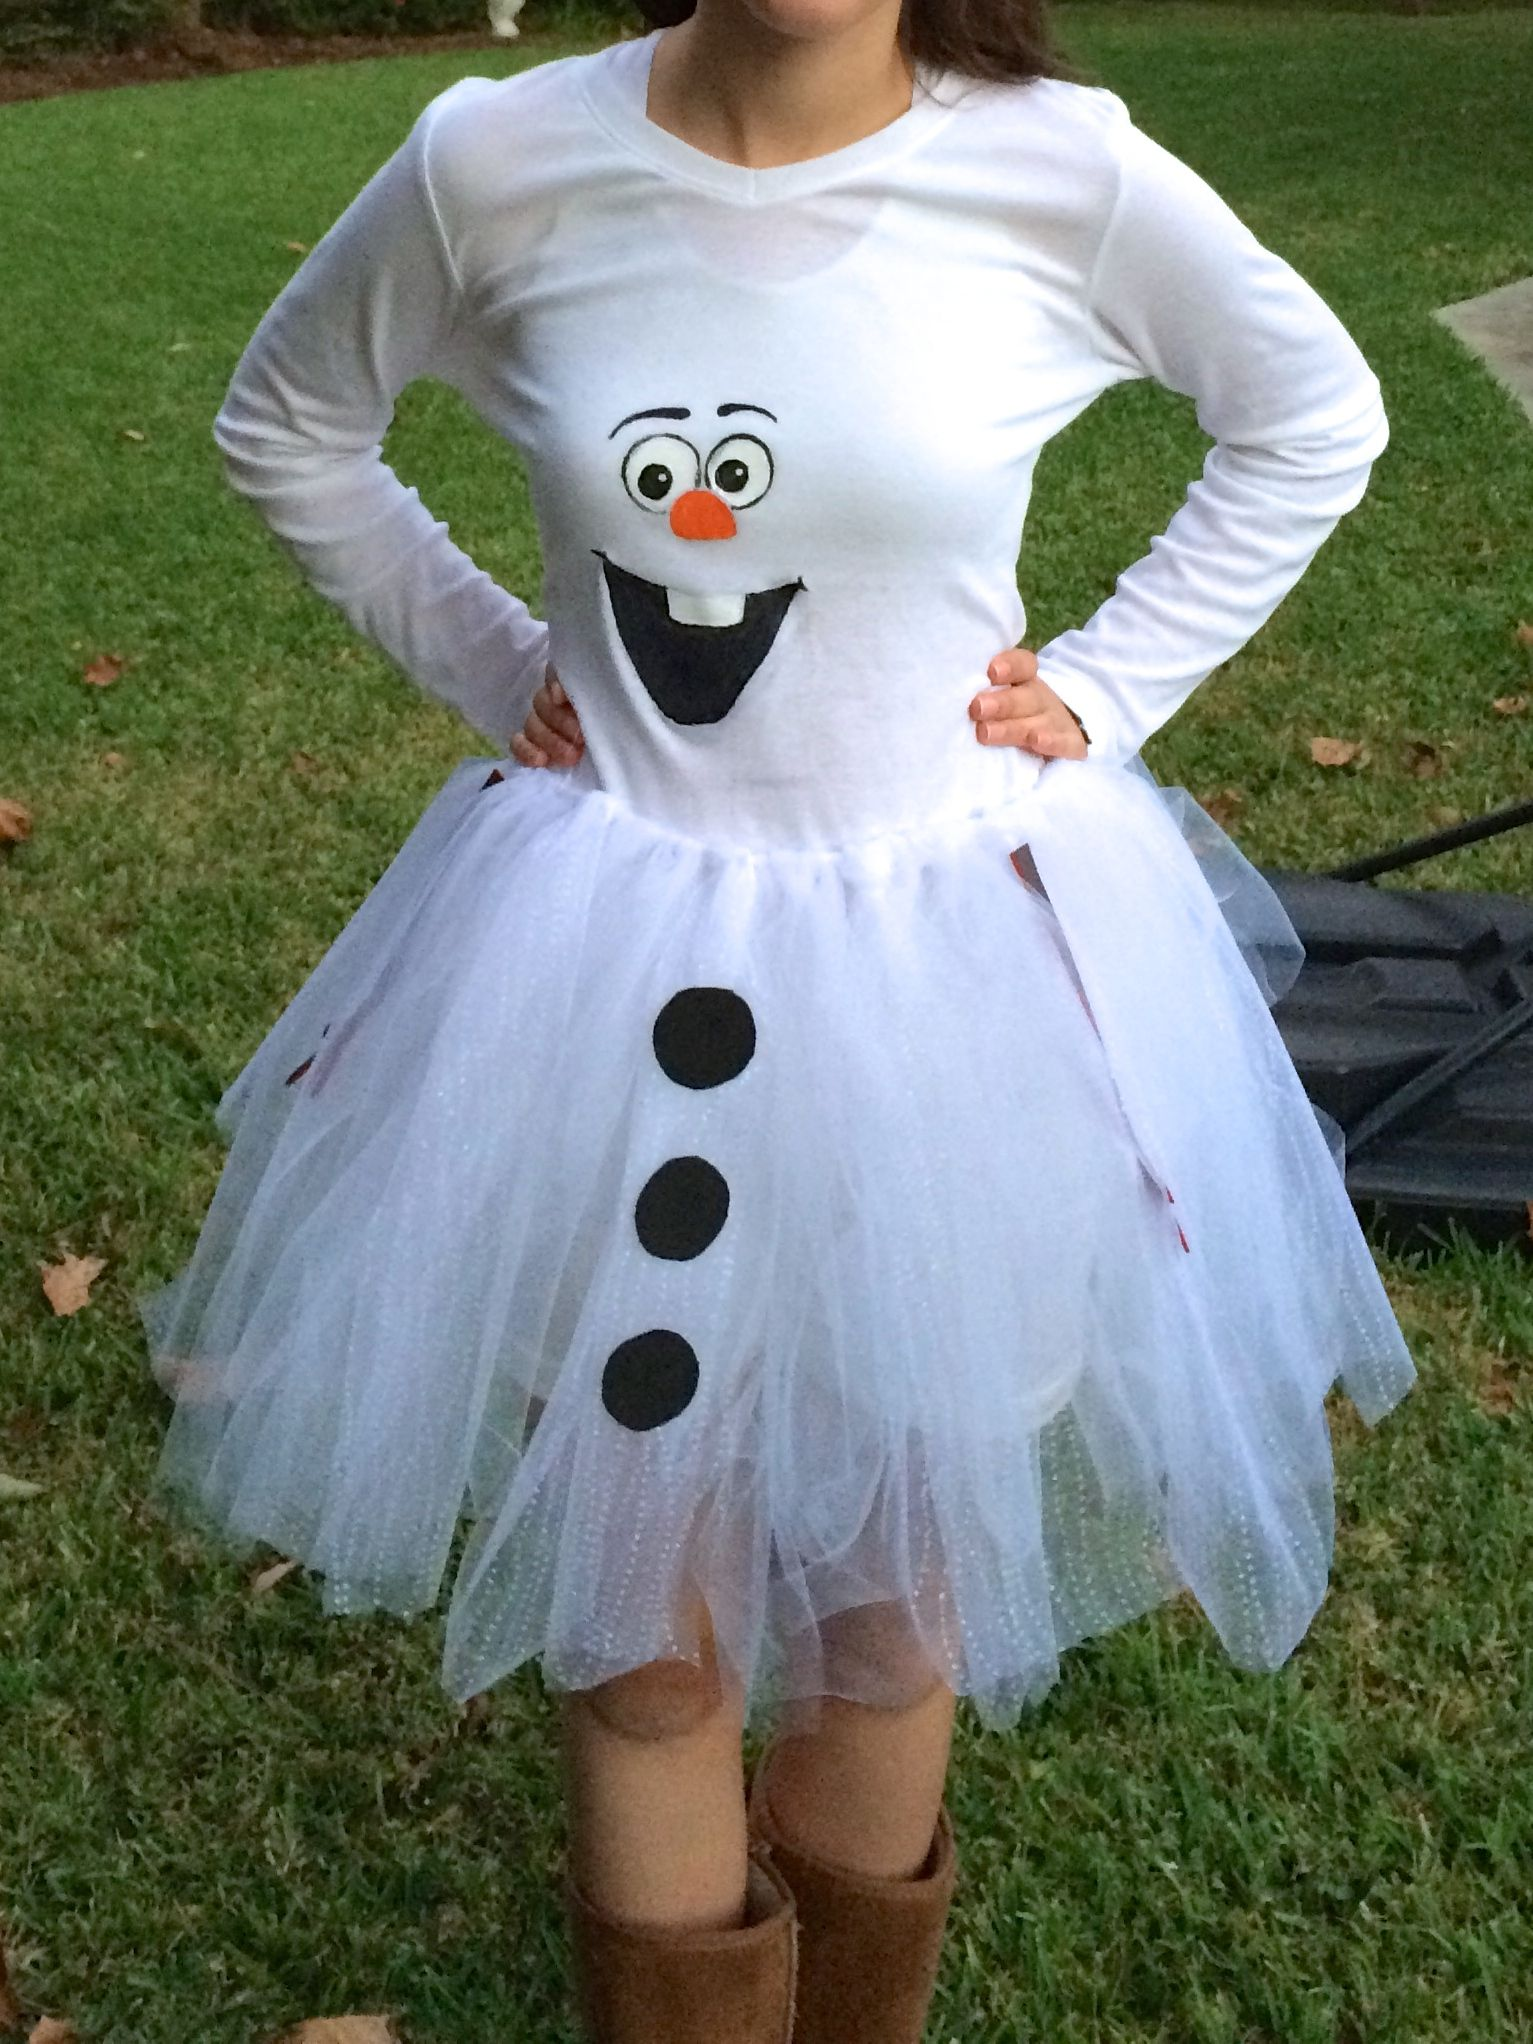 DIY Disney Frozen Olaf Costume  Diy Olaf Costume For Teen Girls